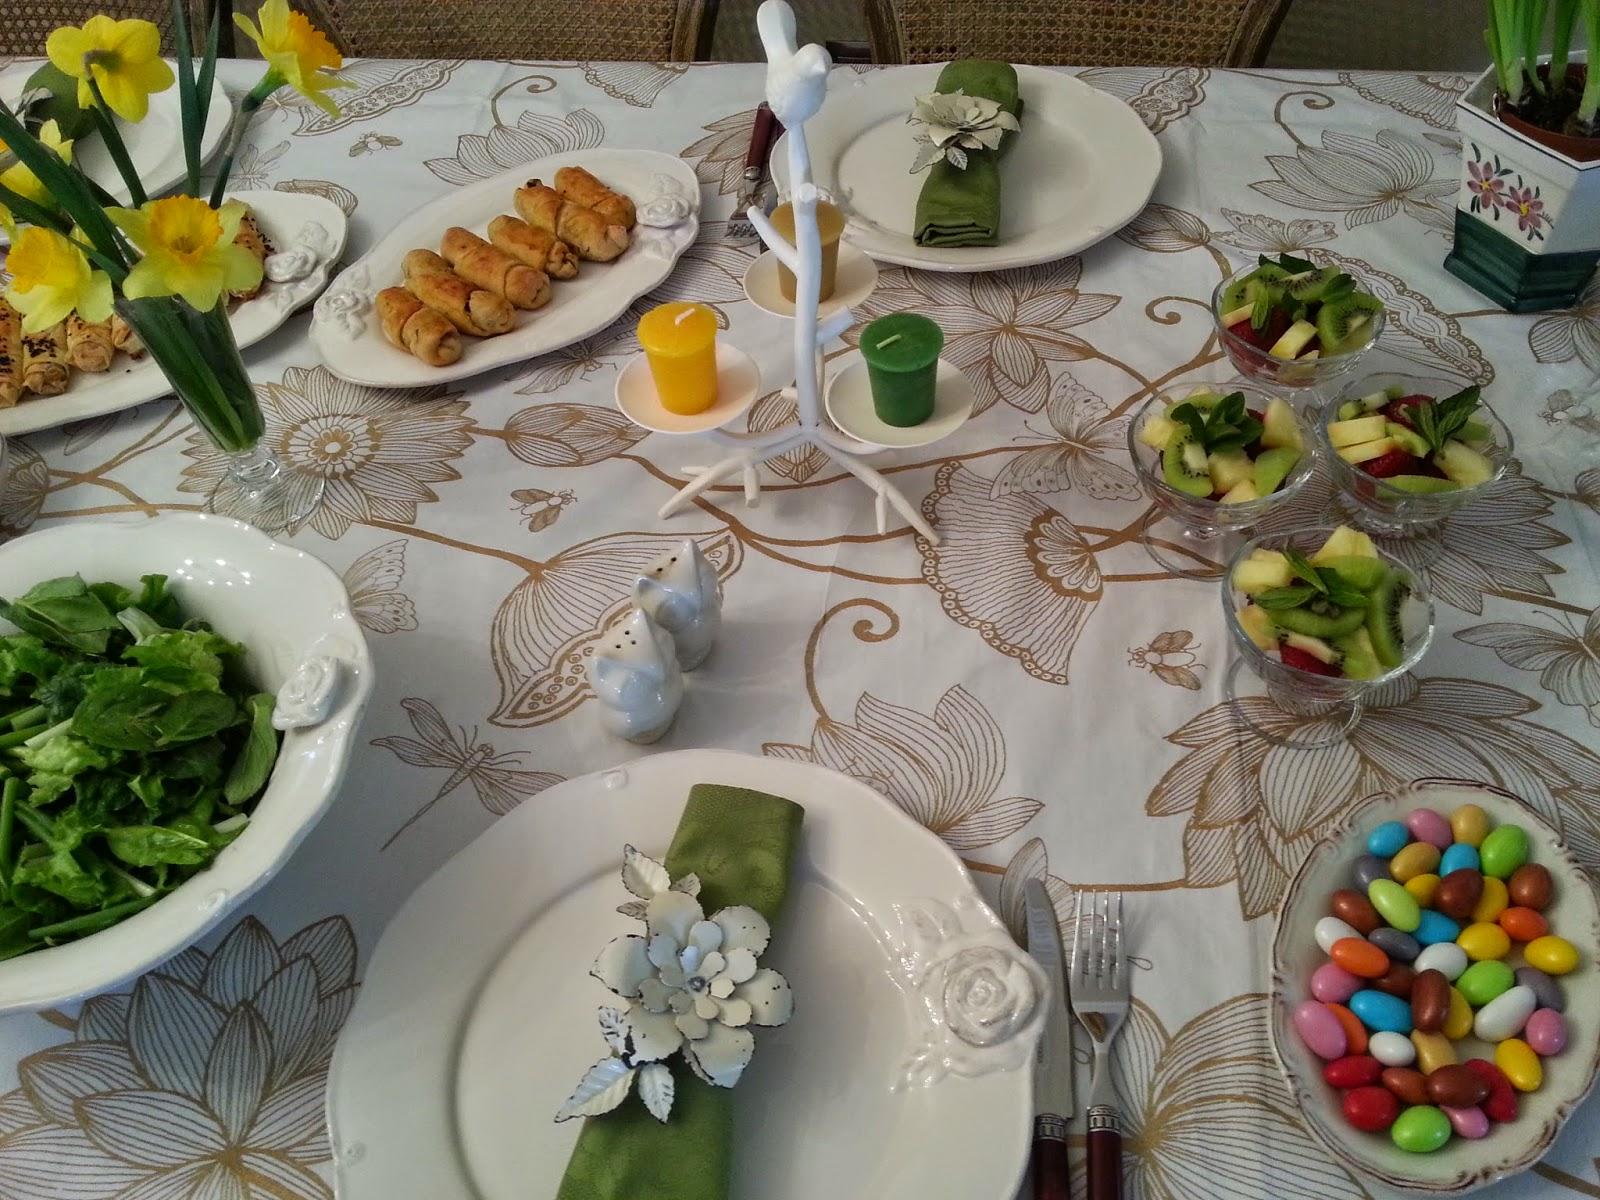 2015  Nergisli  Bahar Sofrası / Table Decoration With Daffodils/ Çay Saati Menüsü